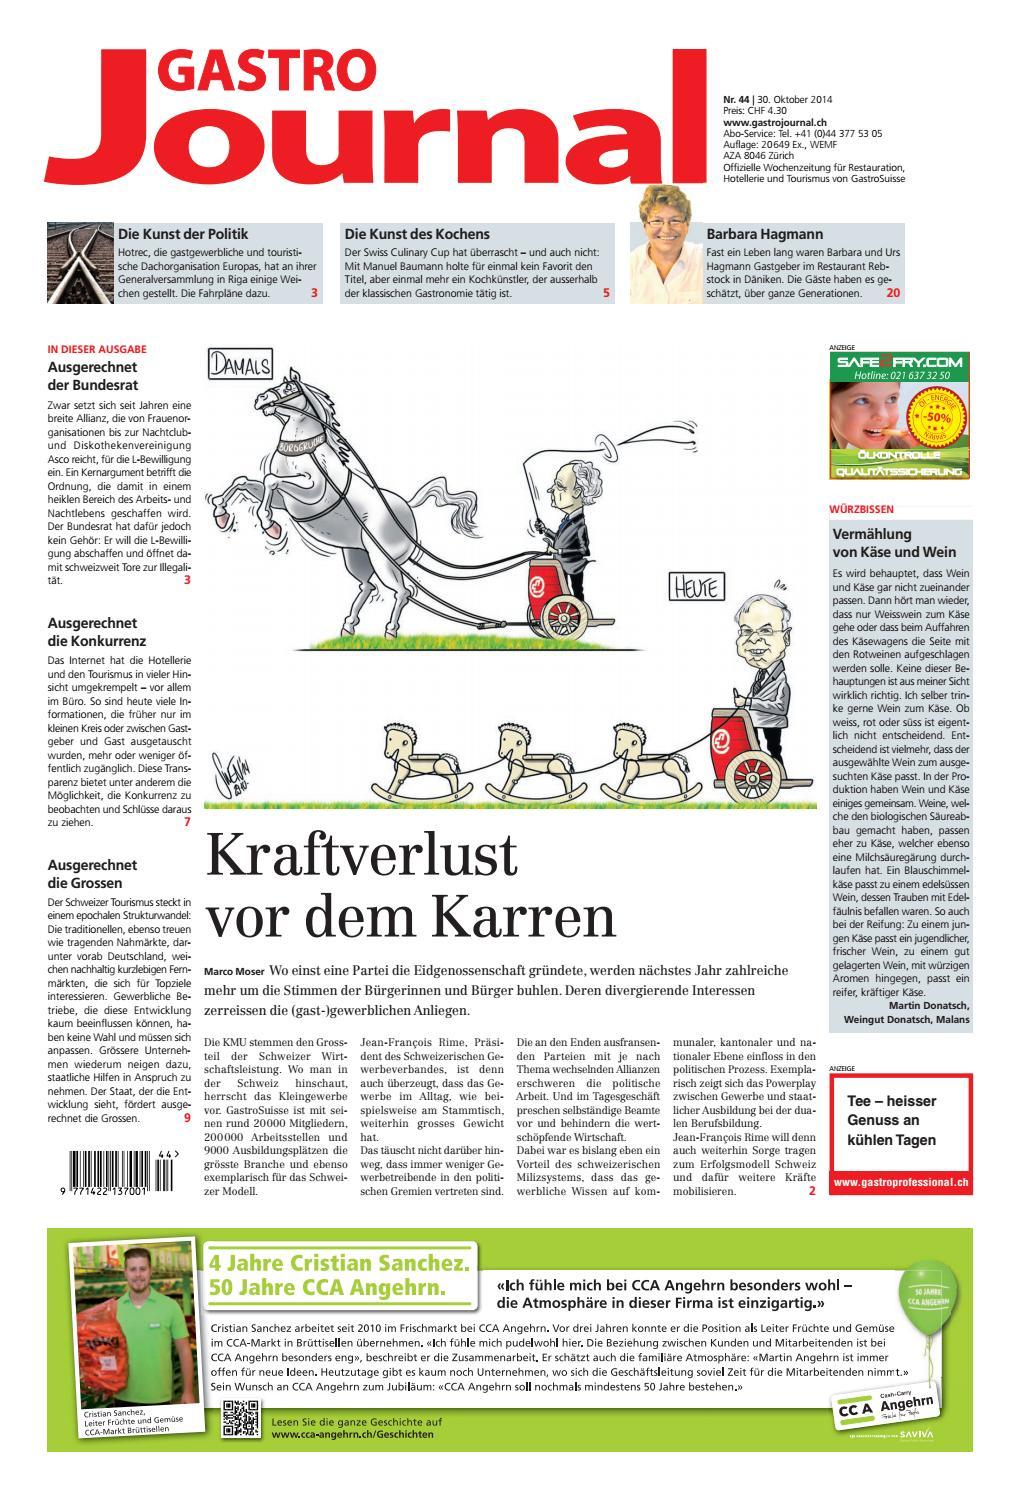 GastroJournal 44 2014 By Gastrojournal